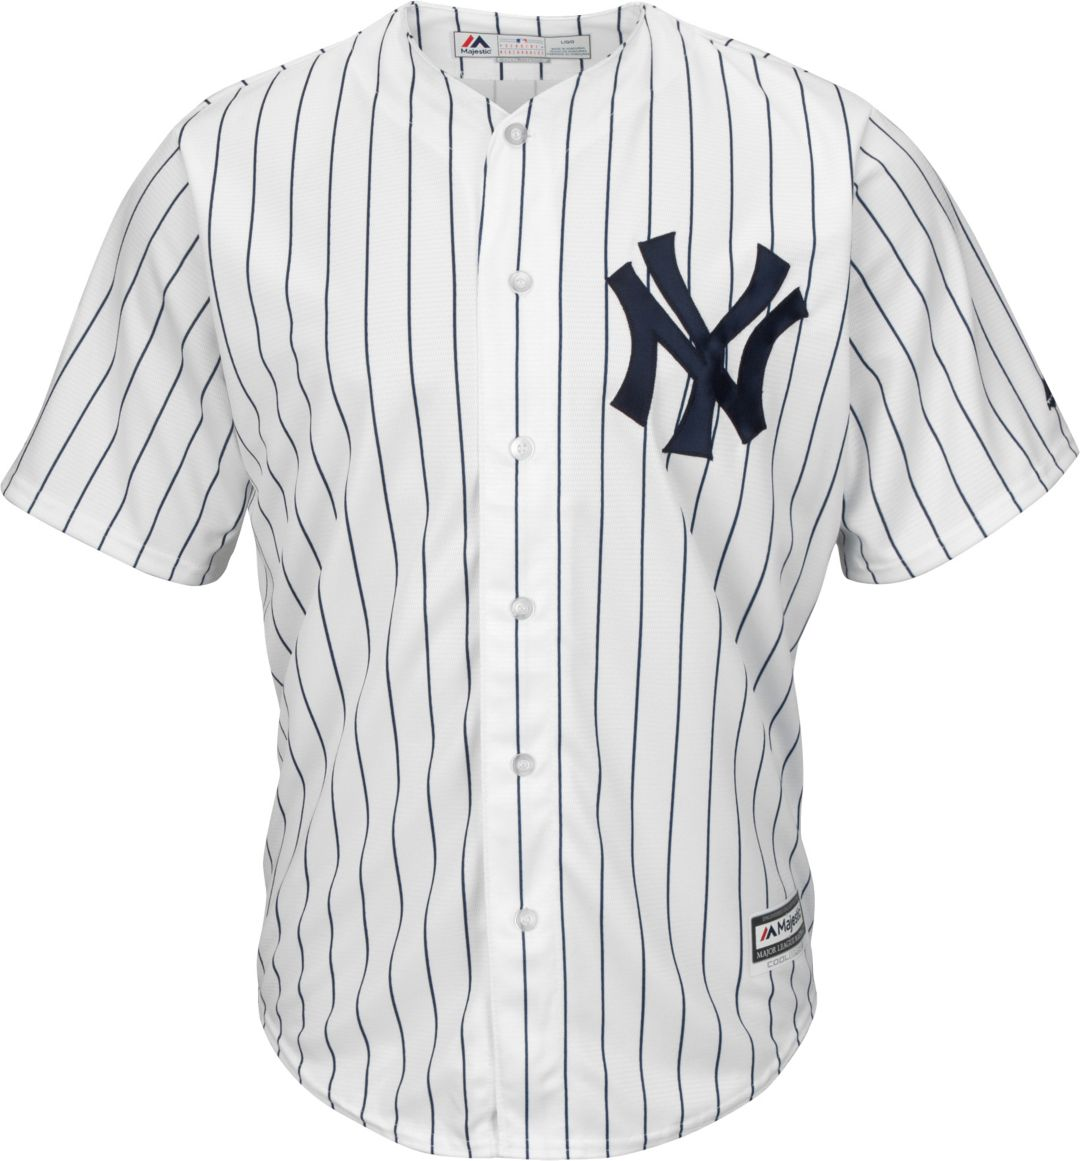 save off 2841b 52085 Majestic Men's Replica New York Yankees Masahiro Tanaka #19 Cool Base Home  White Jersey